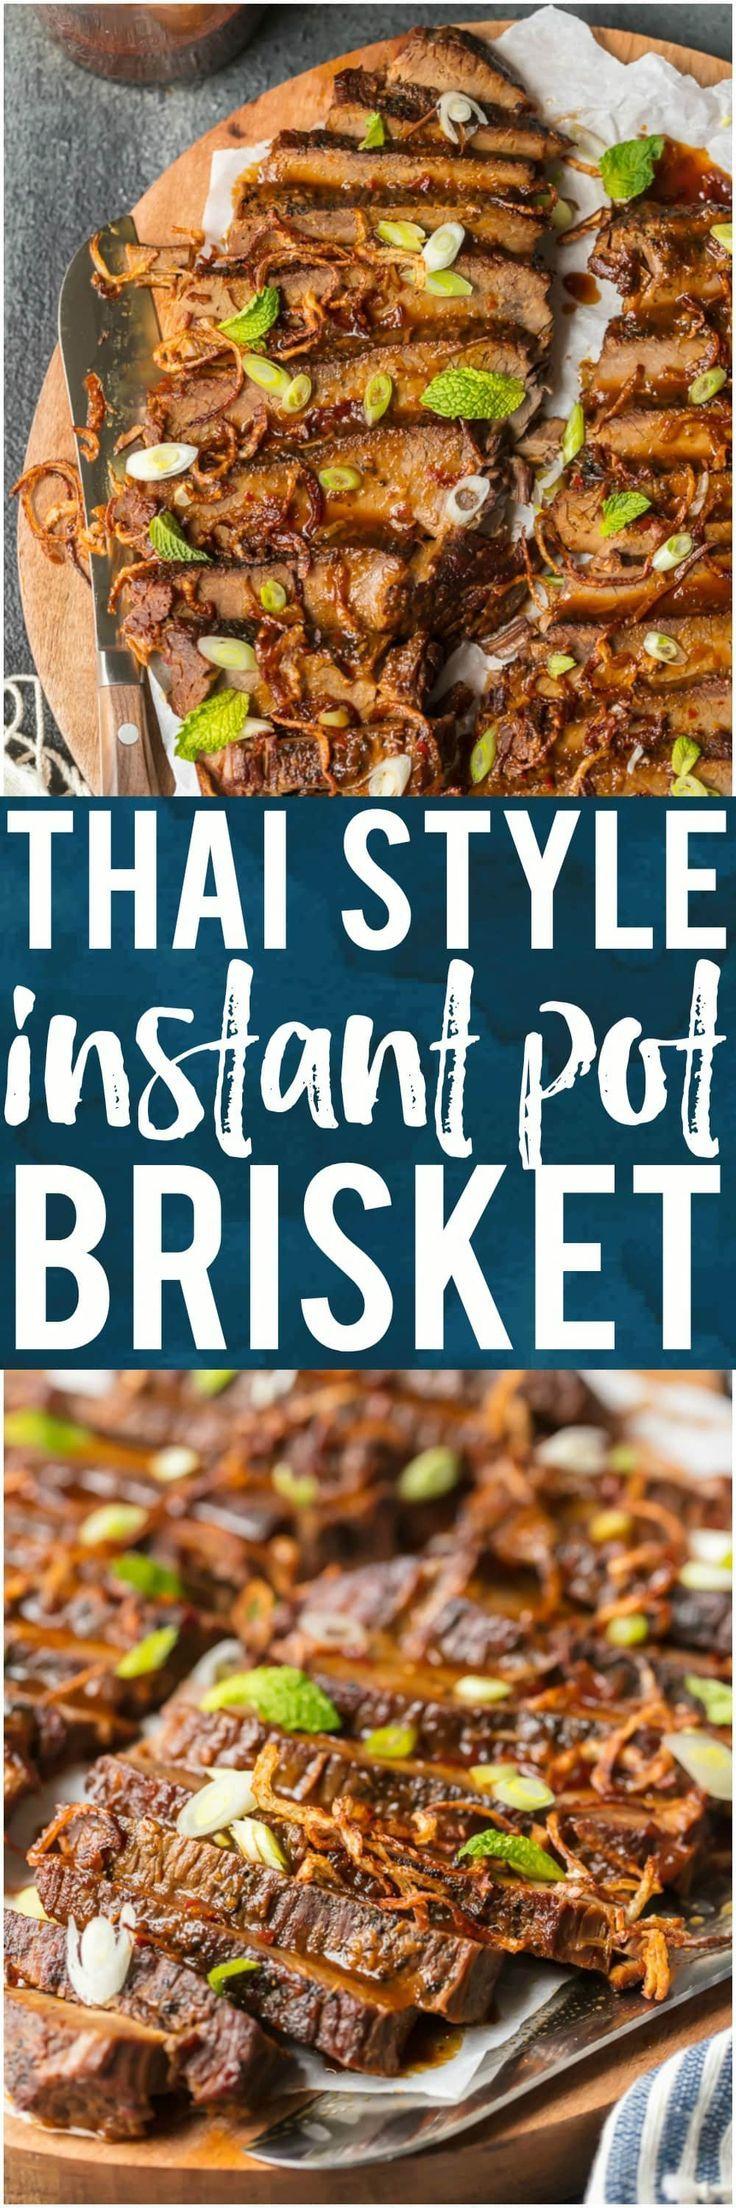 Thai-style Instant Pot Brisket